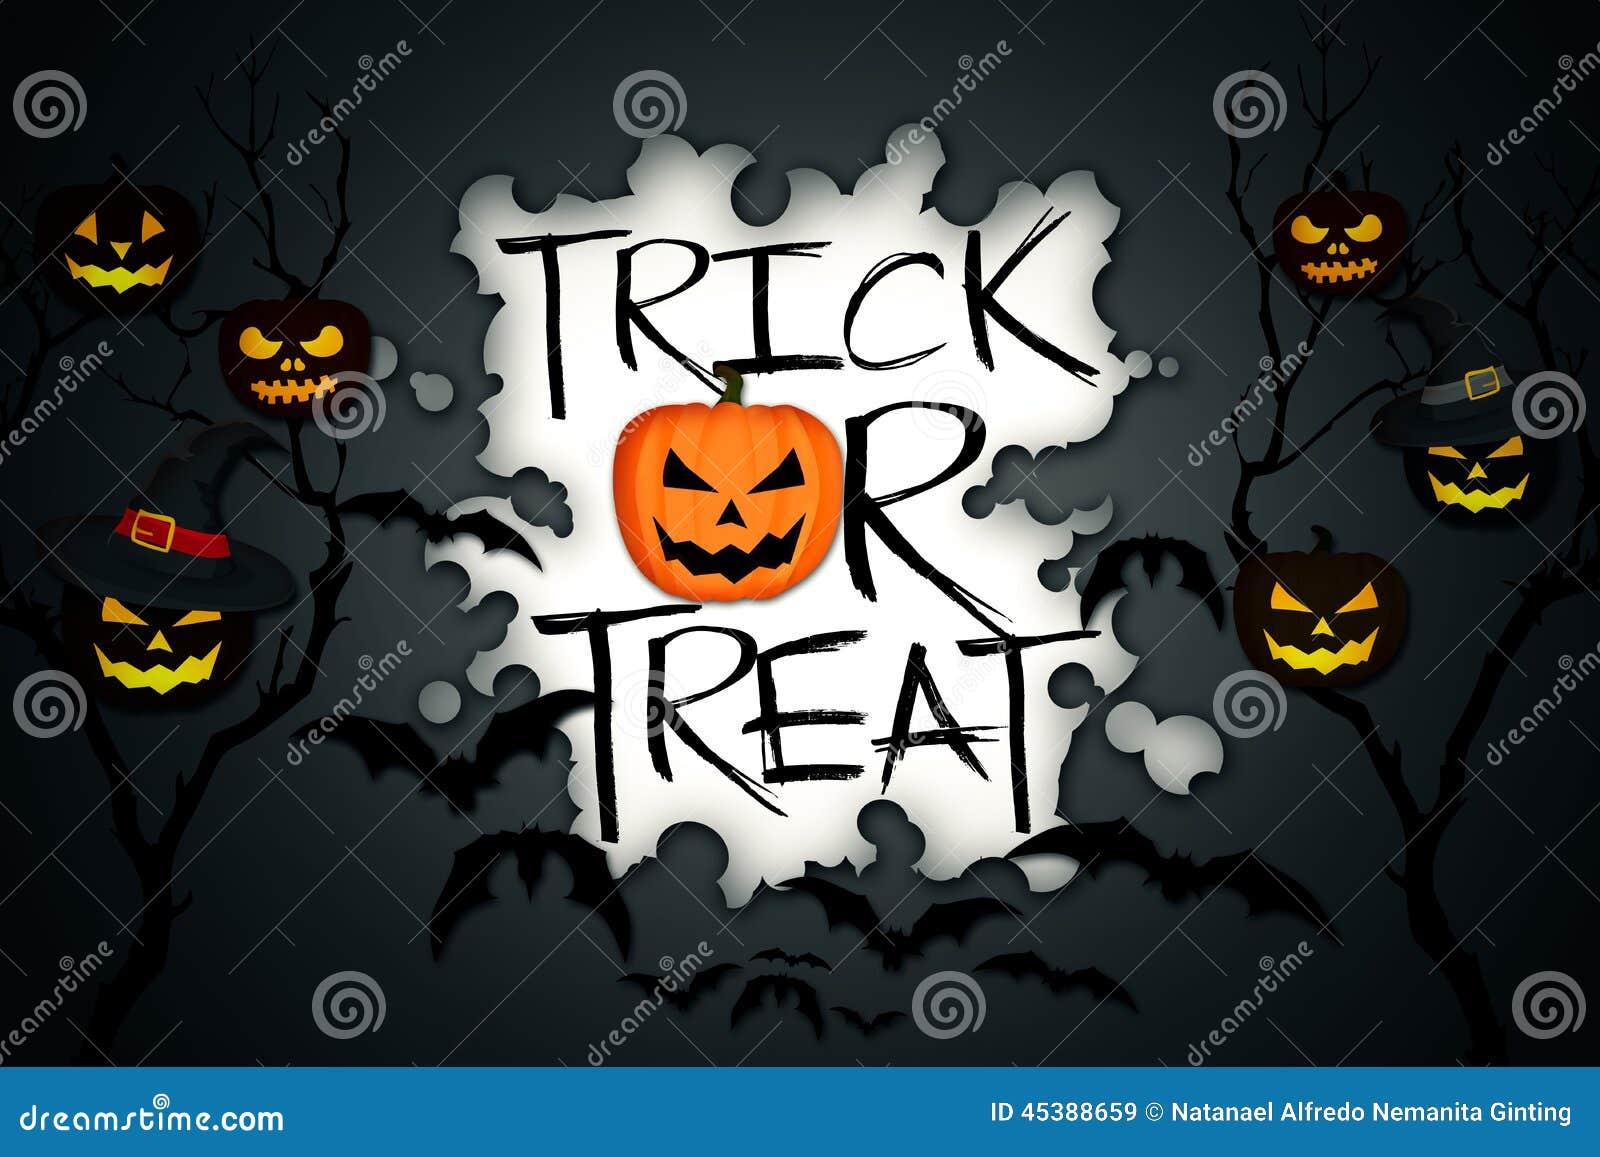 trick or treat tree halloween pumpkins bats black background stock rh dreamstime com